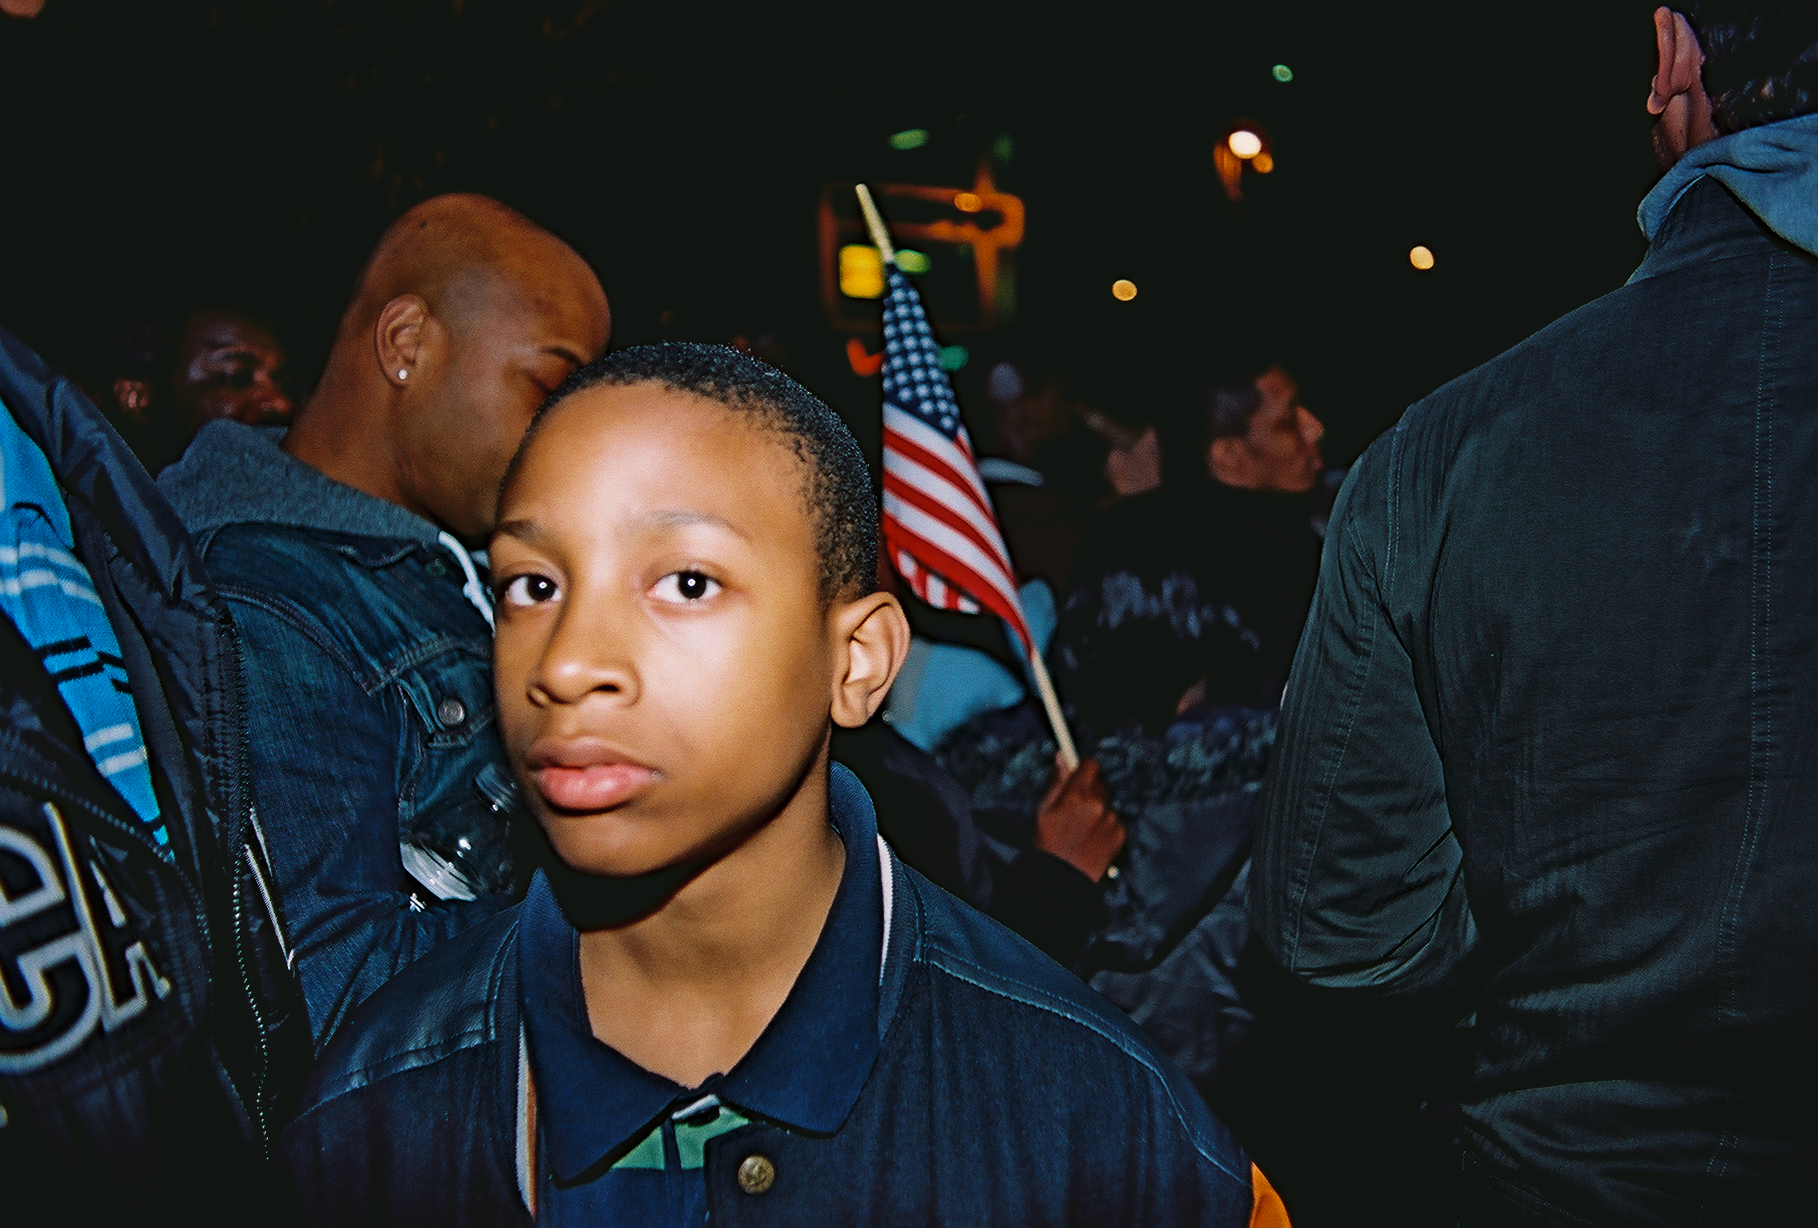 Harlem Young Boy Flag.jpg